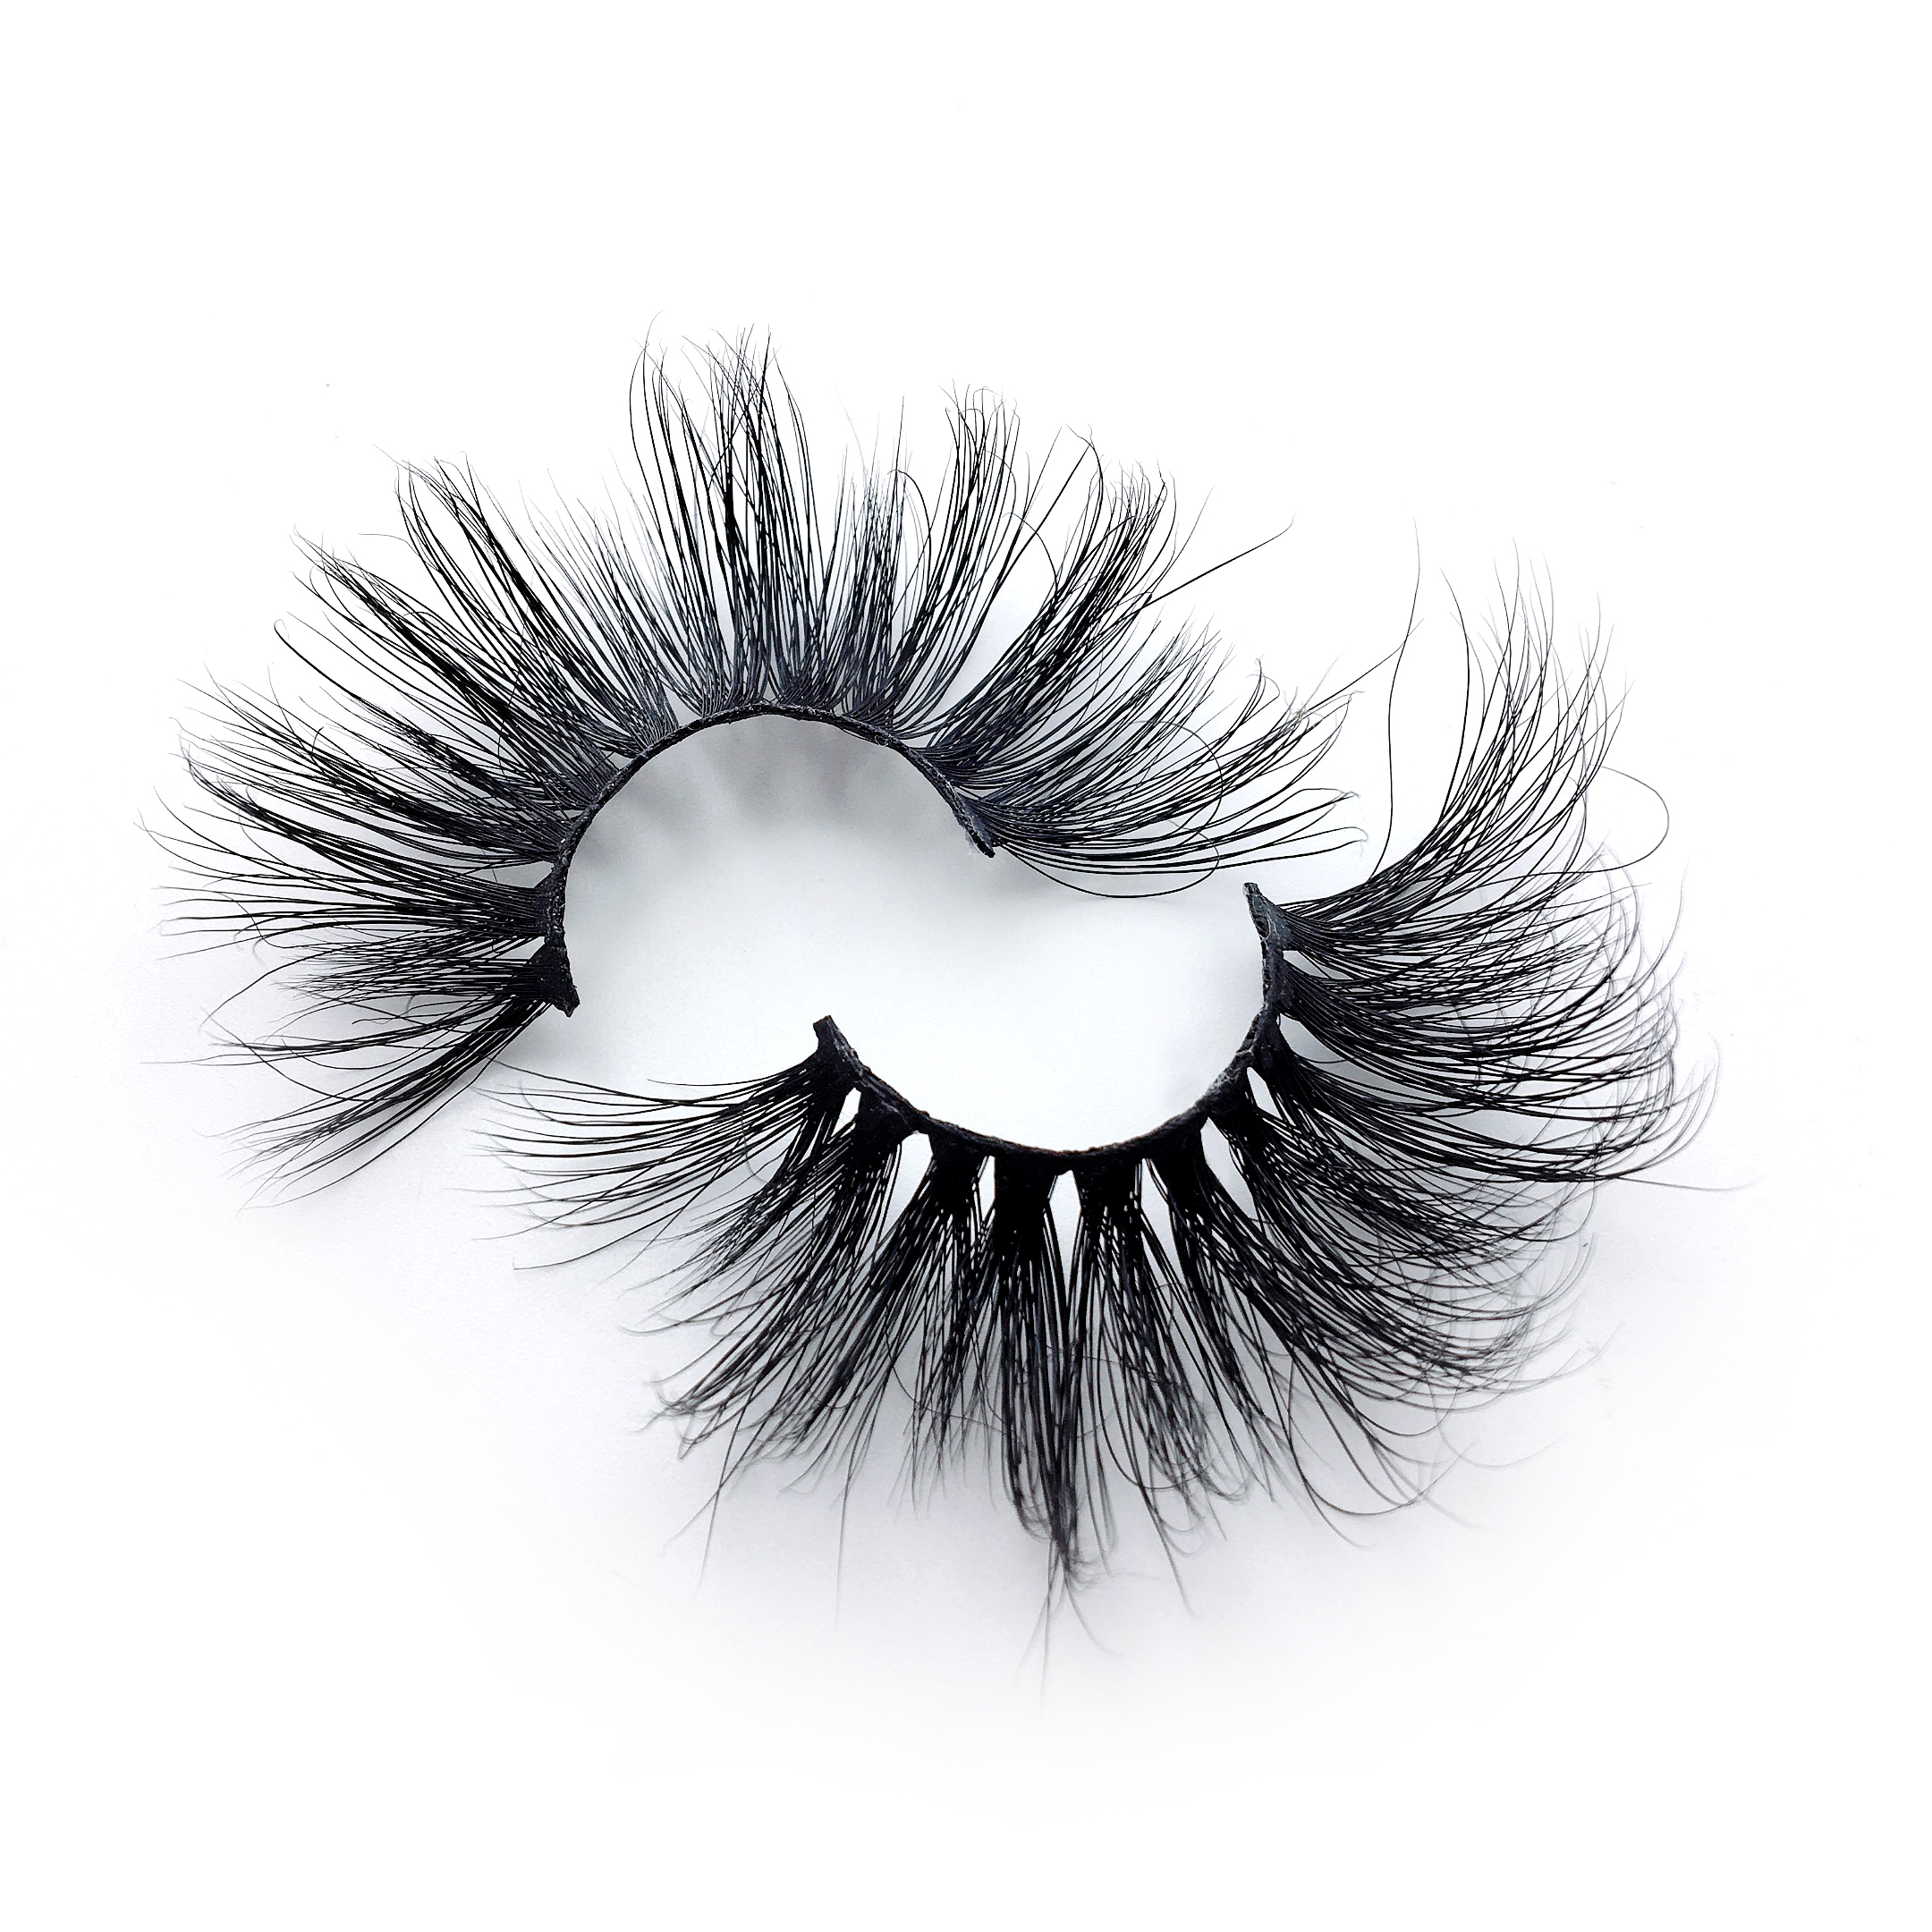 6aa8a0f232b 3) Wholesale customization eshinee mink lashes 27 mm 25mm eyelashes 3d With Custom  Packaging Your Own Logo Eyelash Box